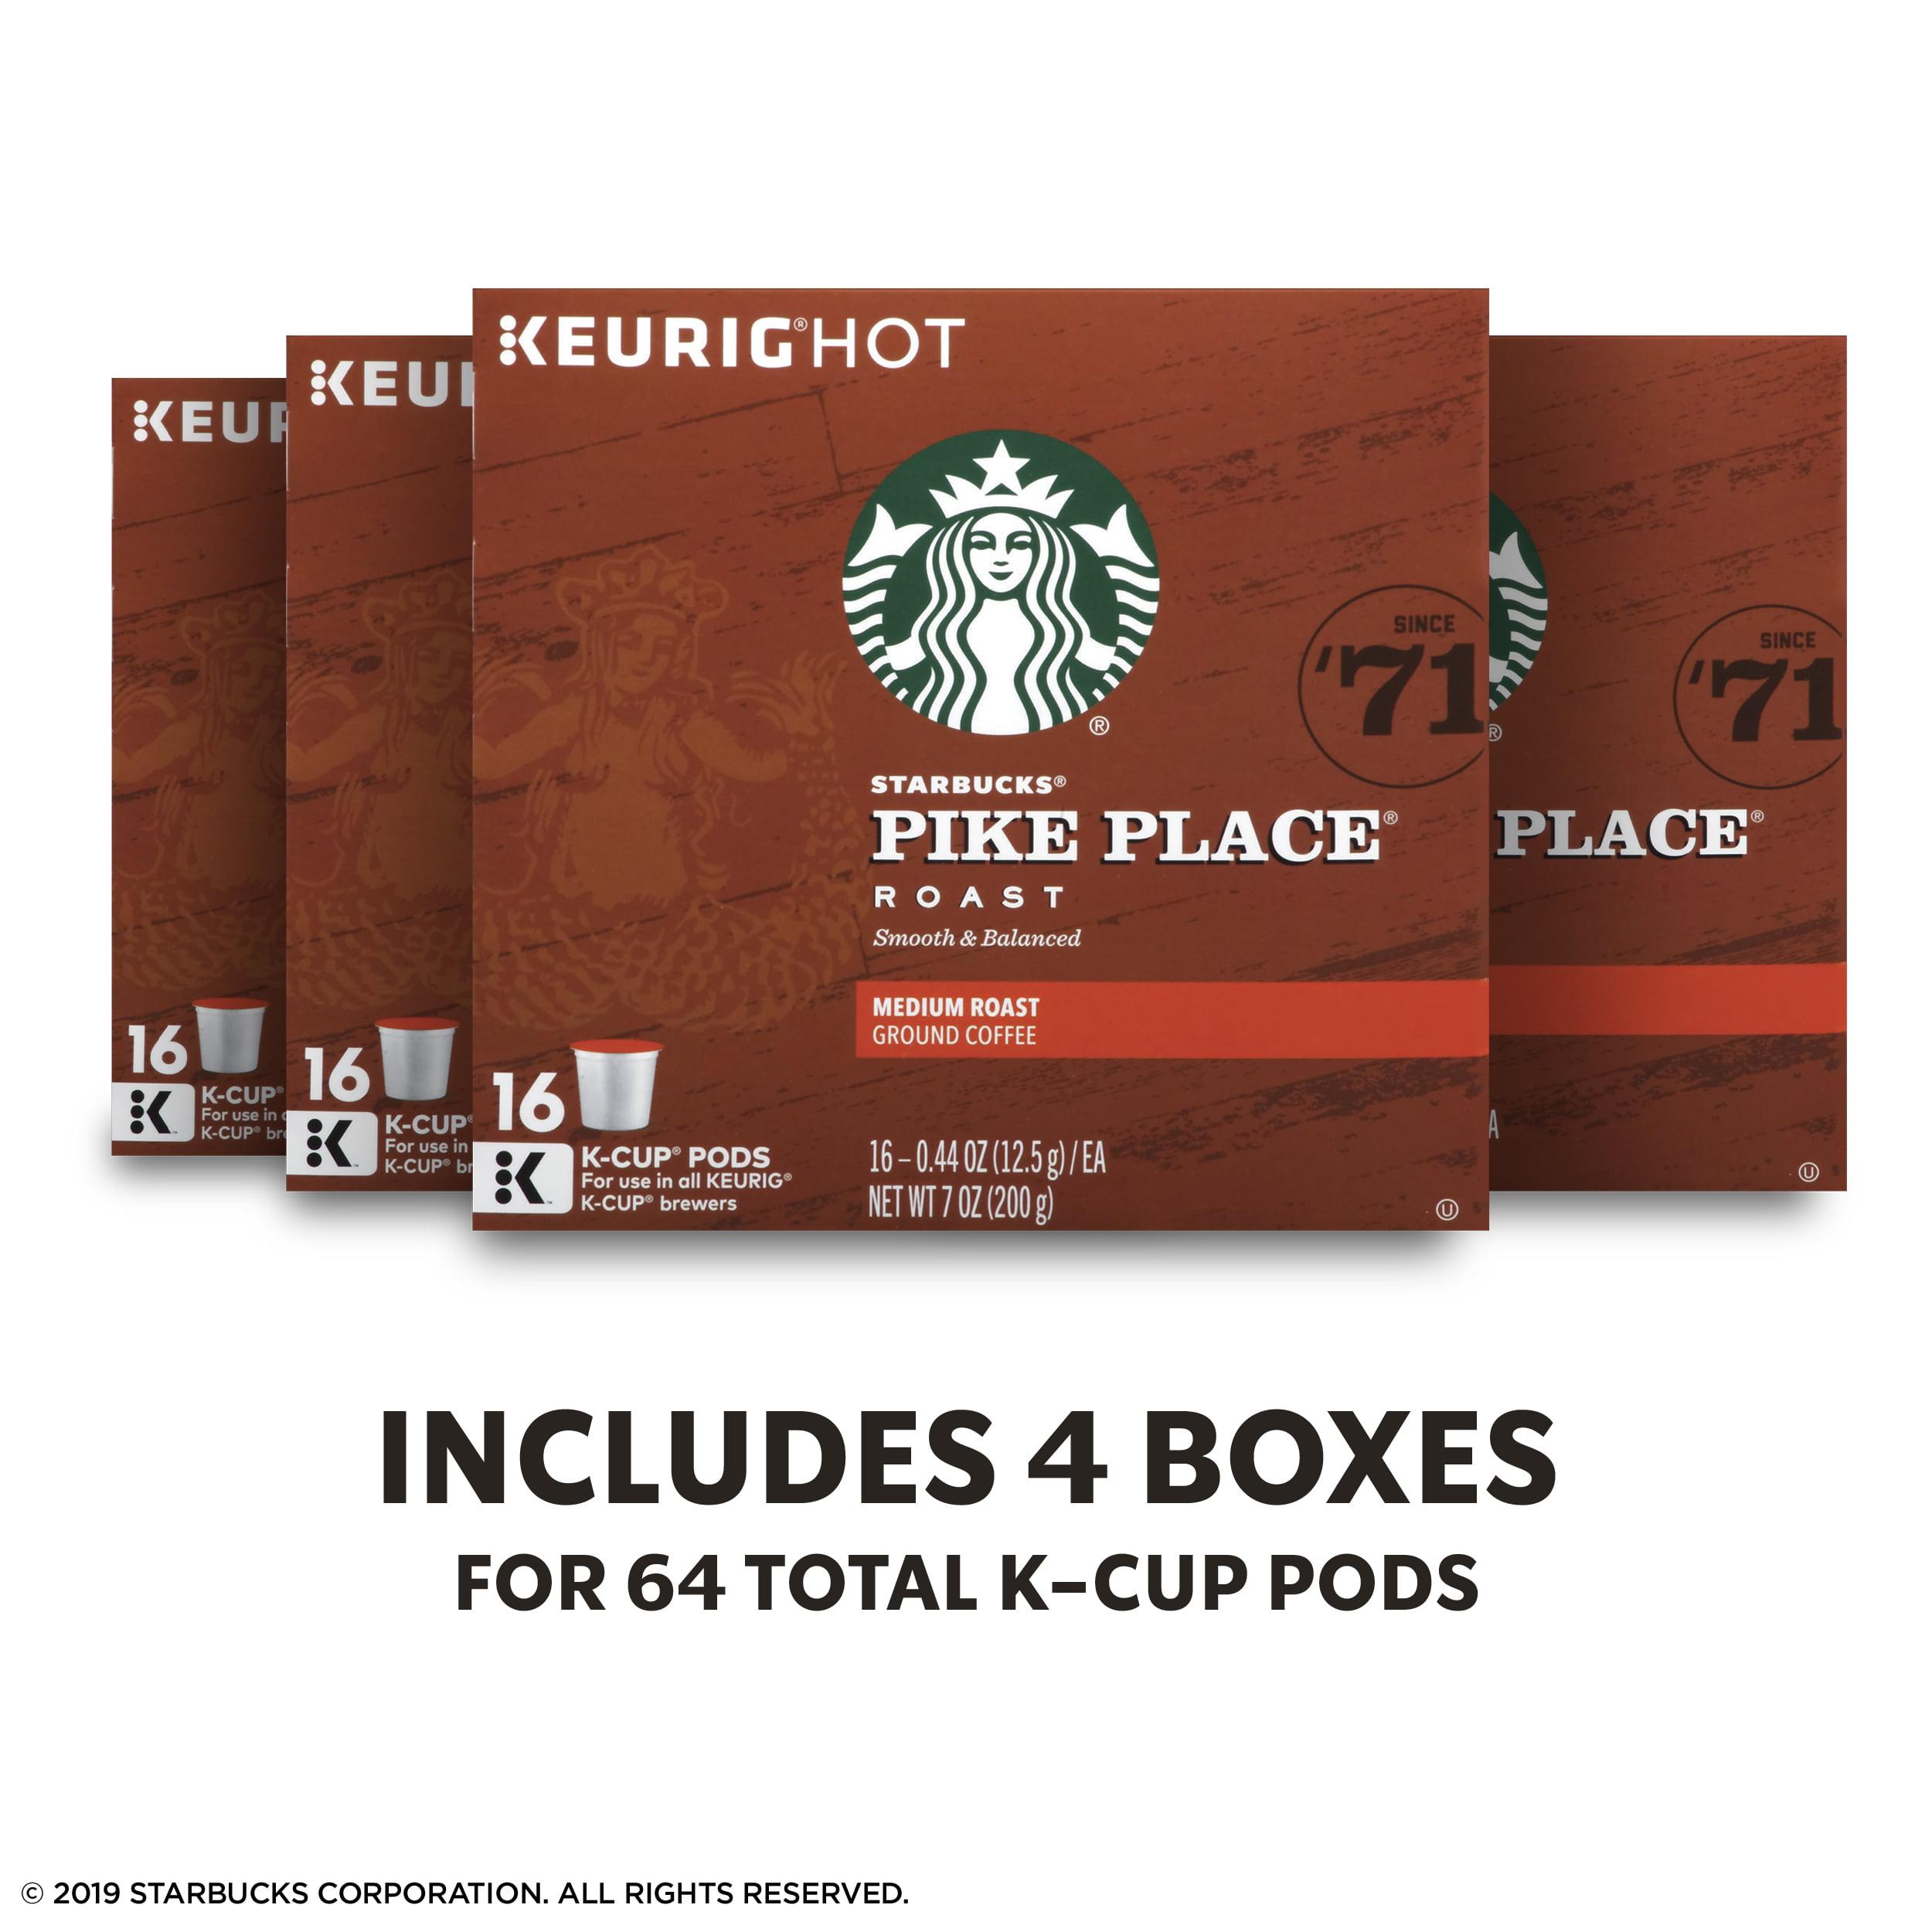 8a90cf09244 Starbucks Pike Place Roast Medium Roast Single Cup Coffee for Keurig  Brewers